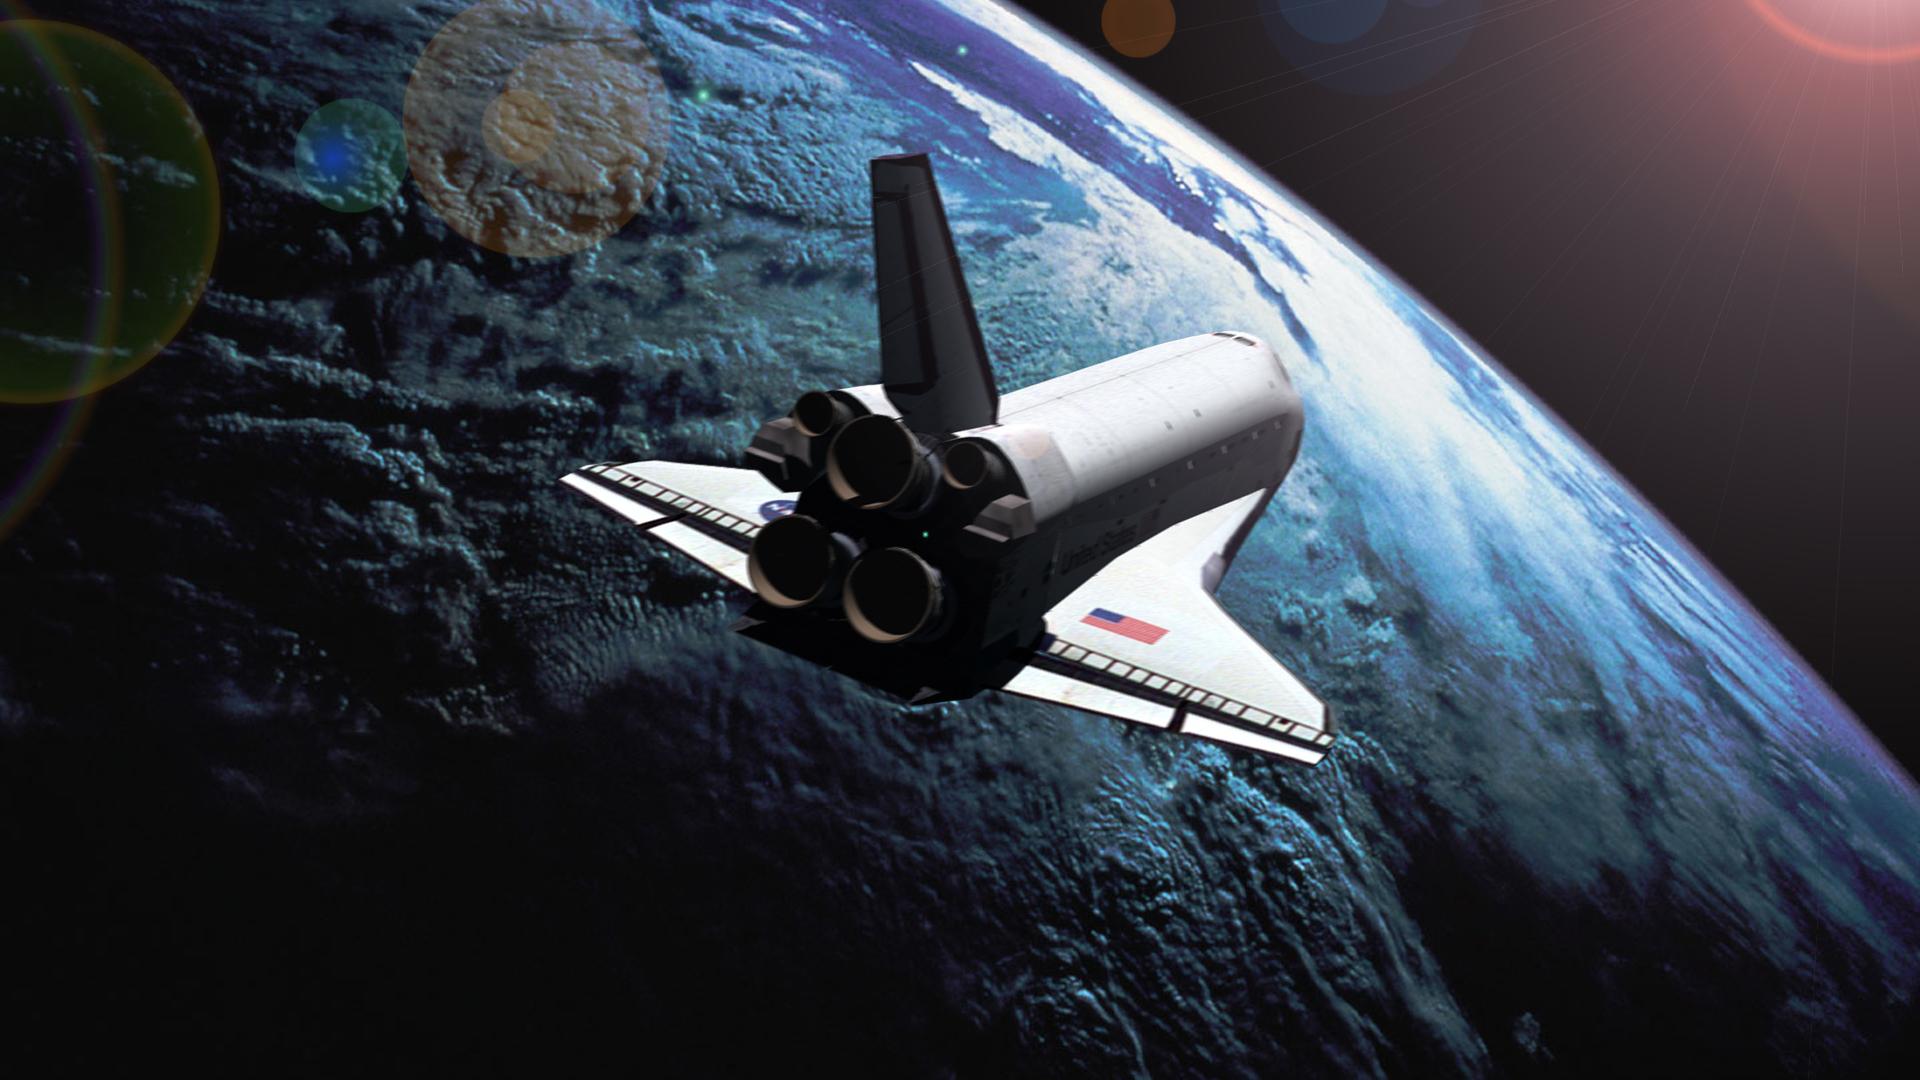 the core movie space shuttle landing - photo #14